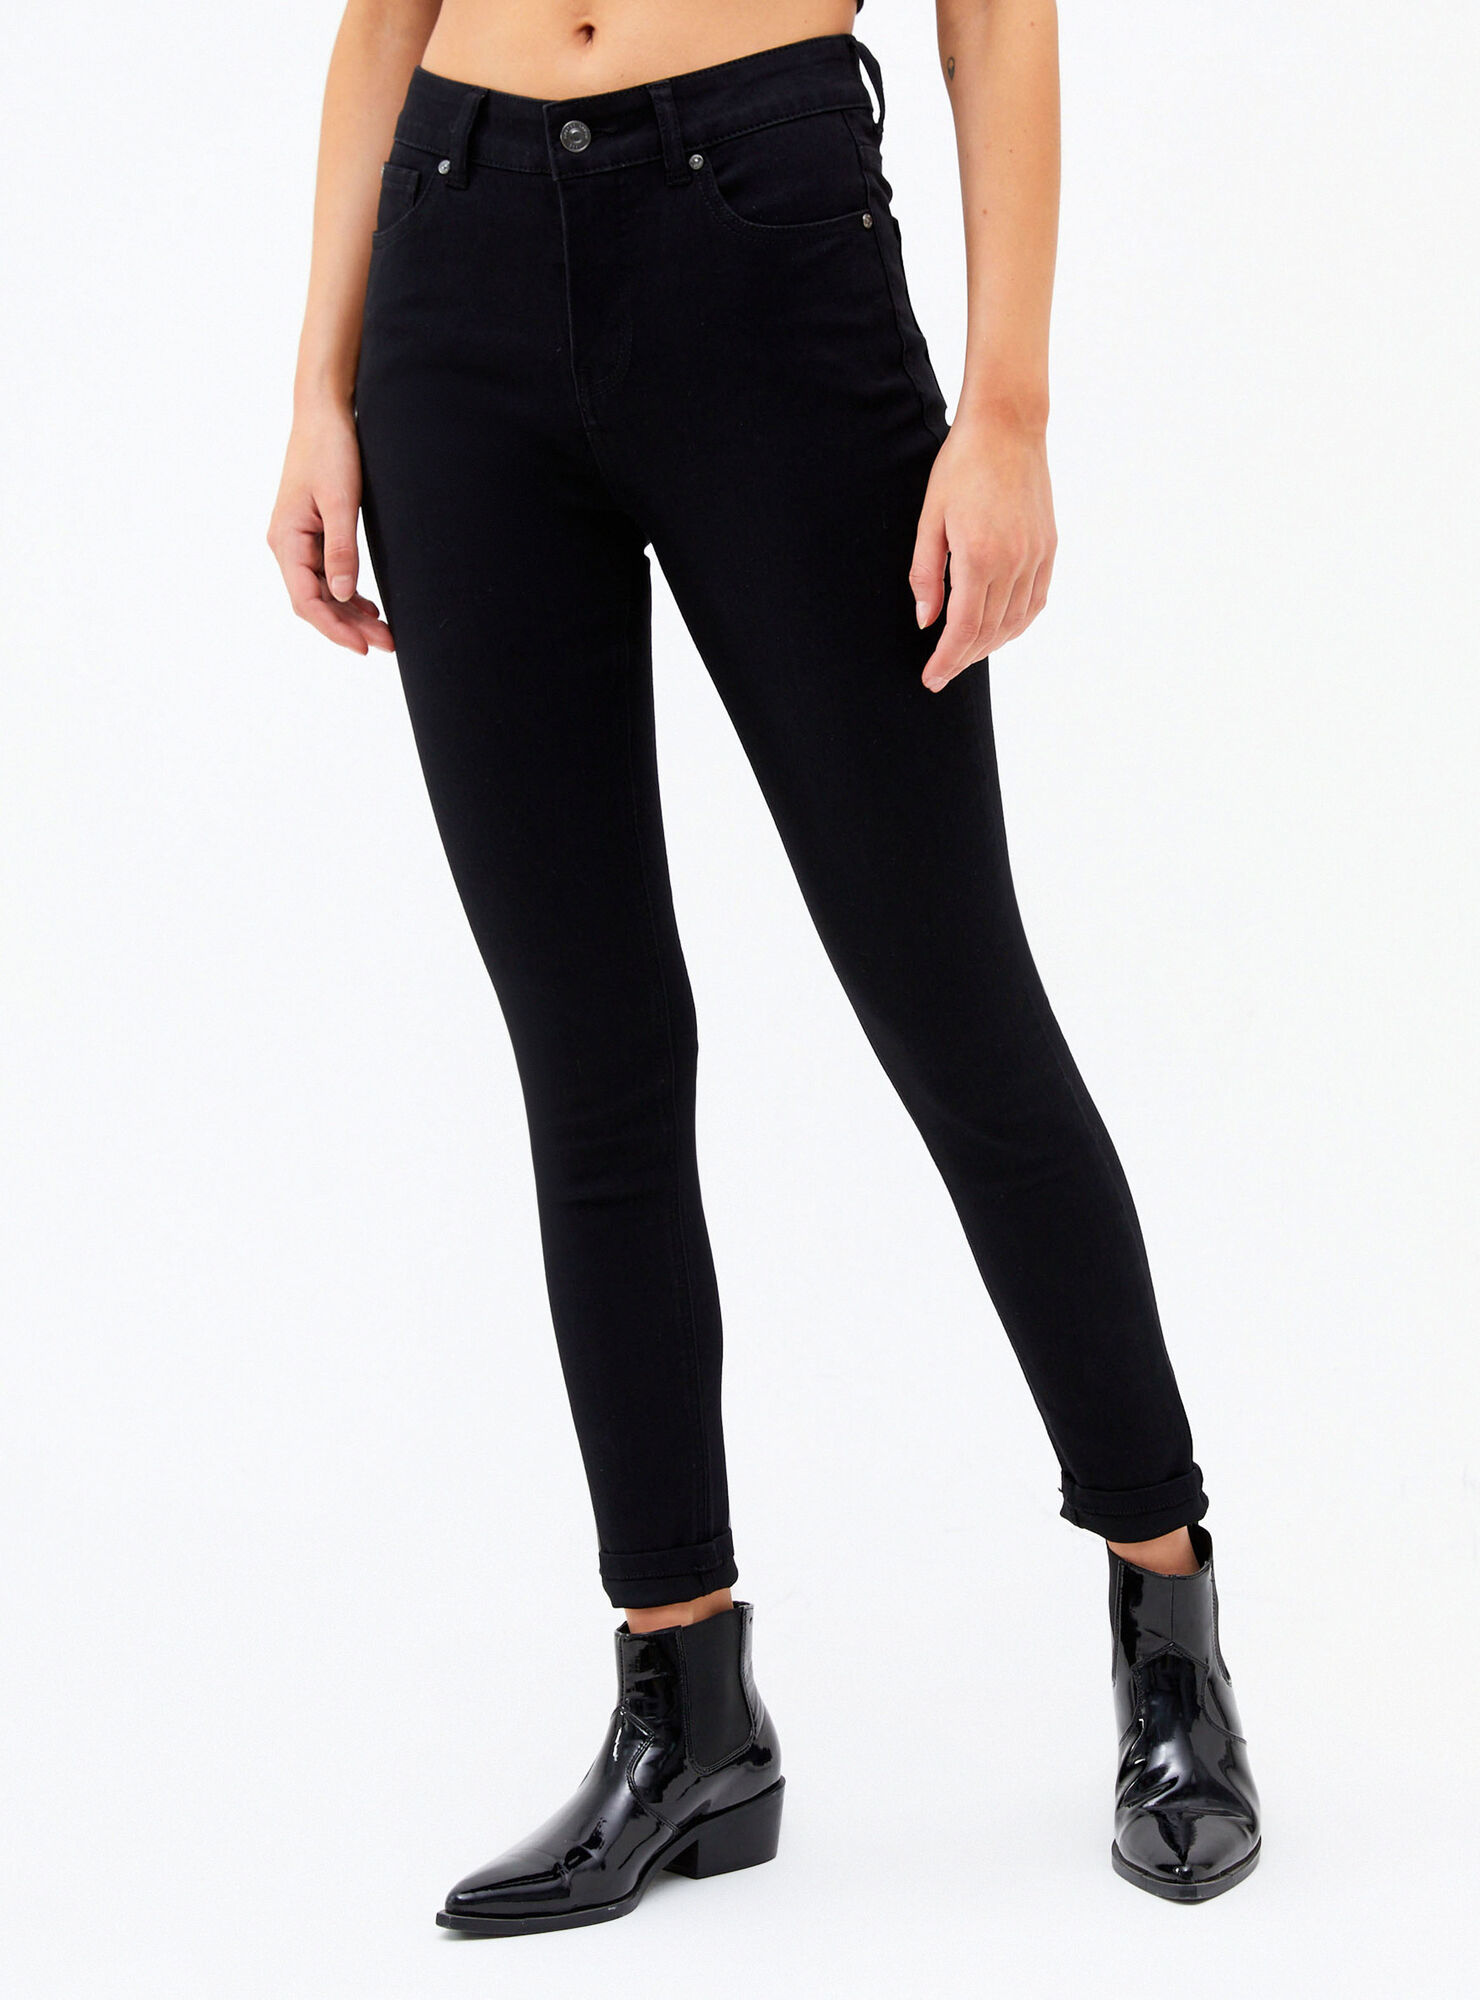 Jeans Basico Skinny Tiro Alto Foster Jeans Y Pantalones Paris Cl